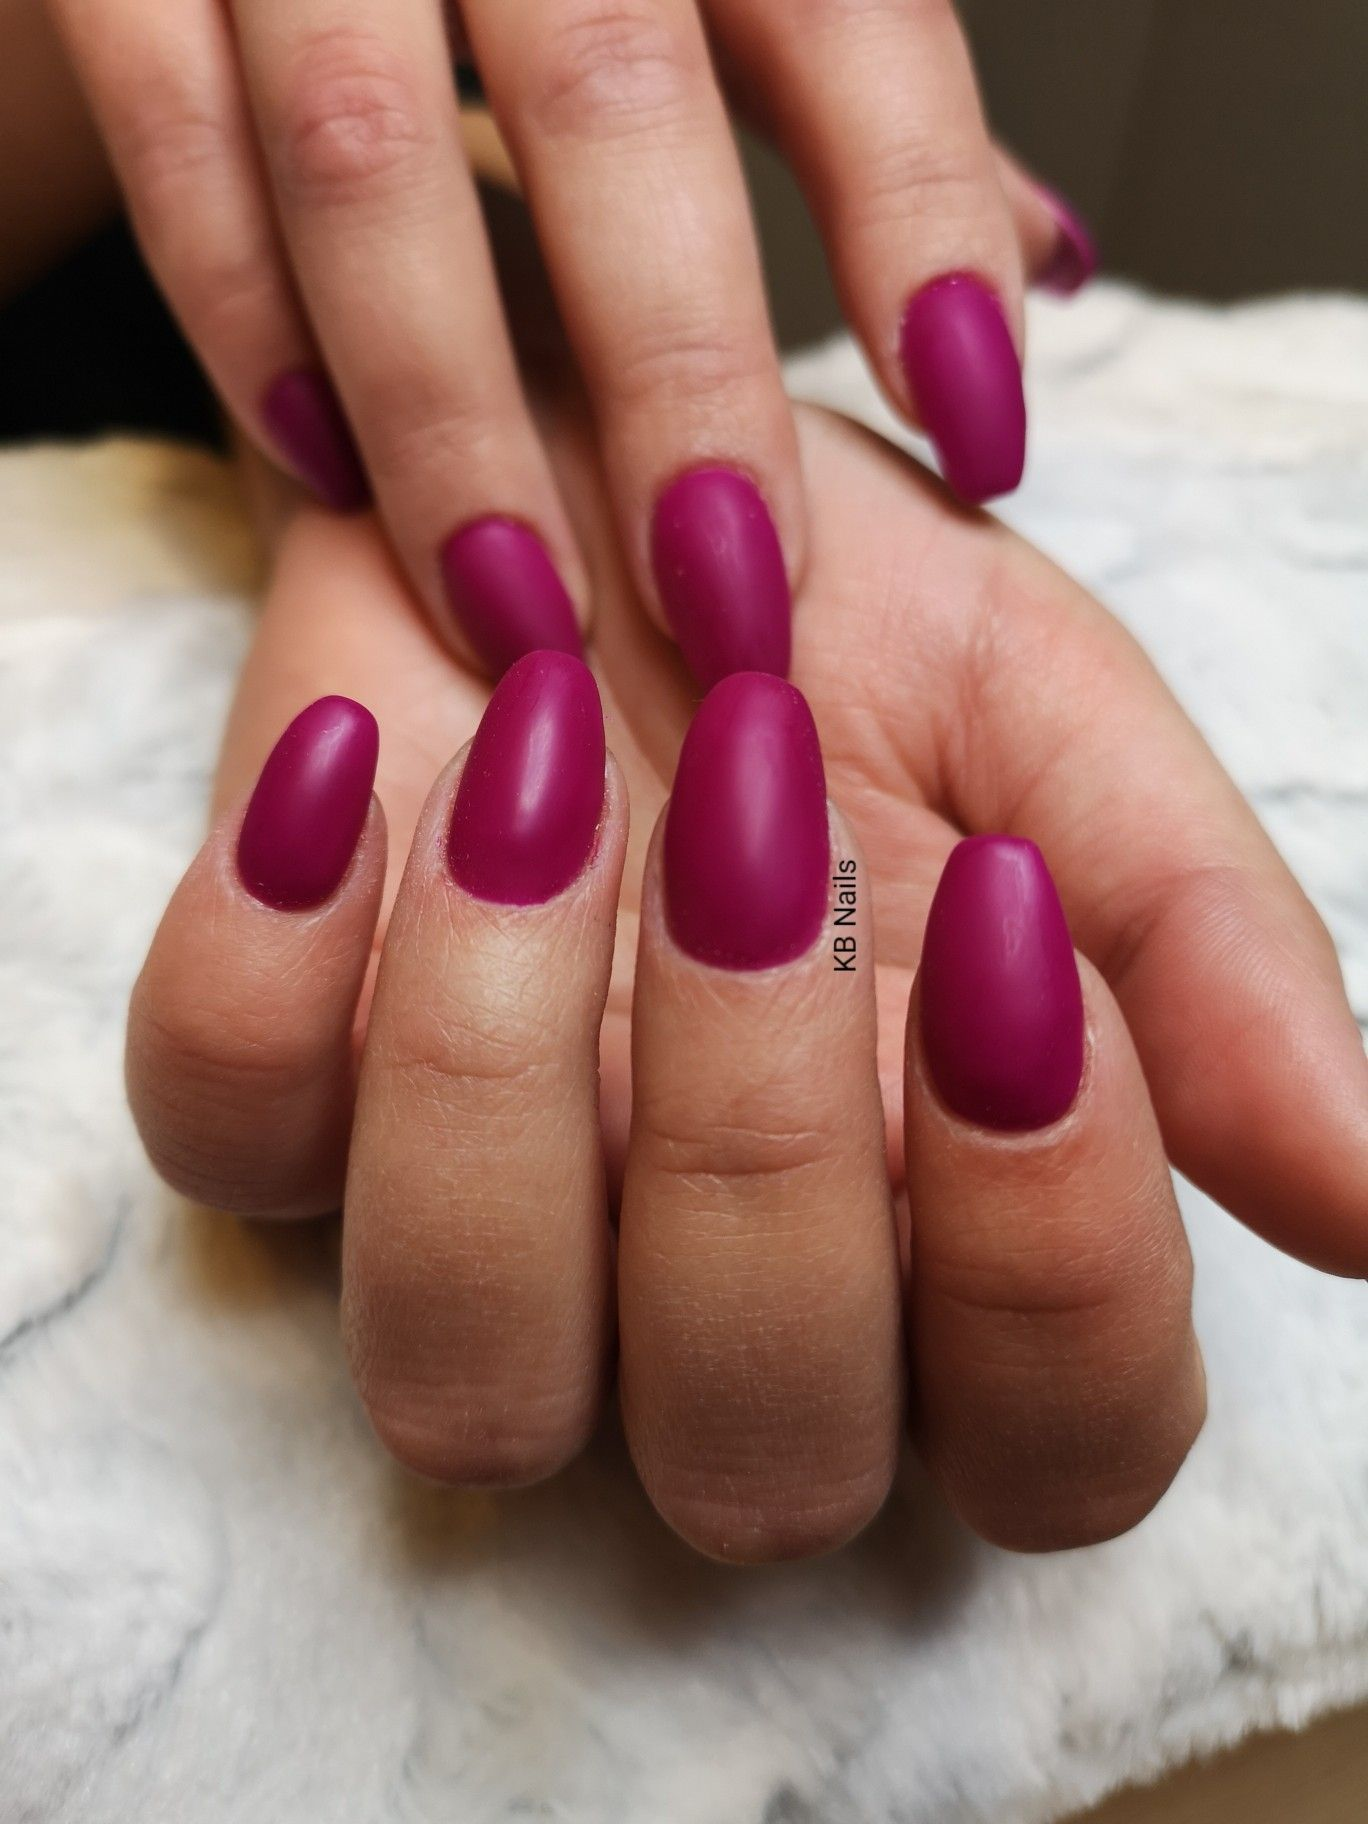 Pin by Dorota Zaremba on my passion - nails   Nails